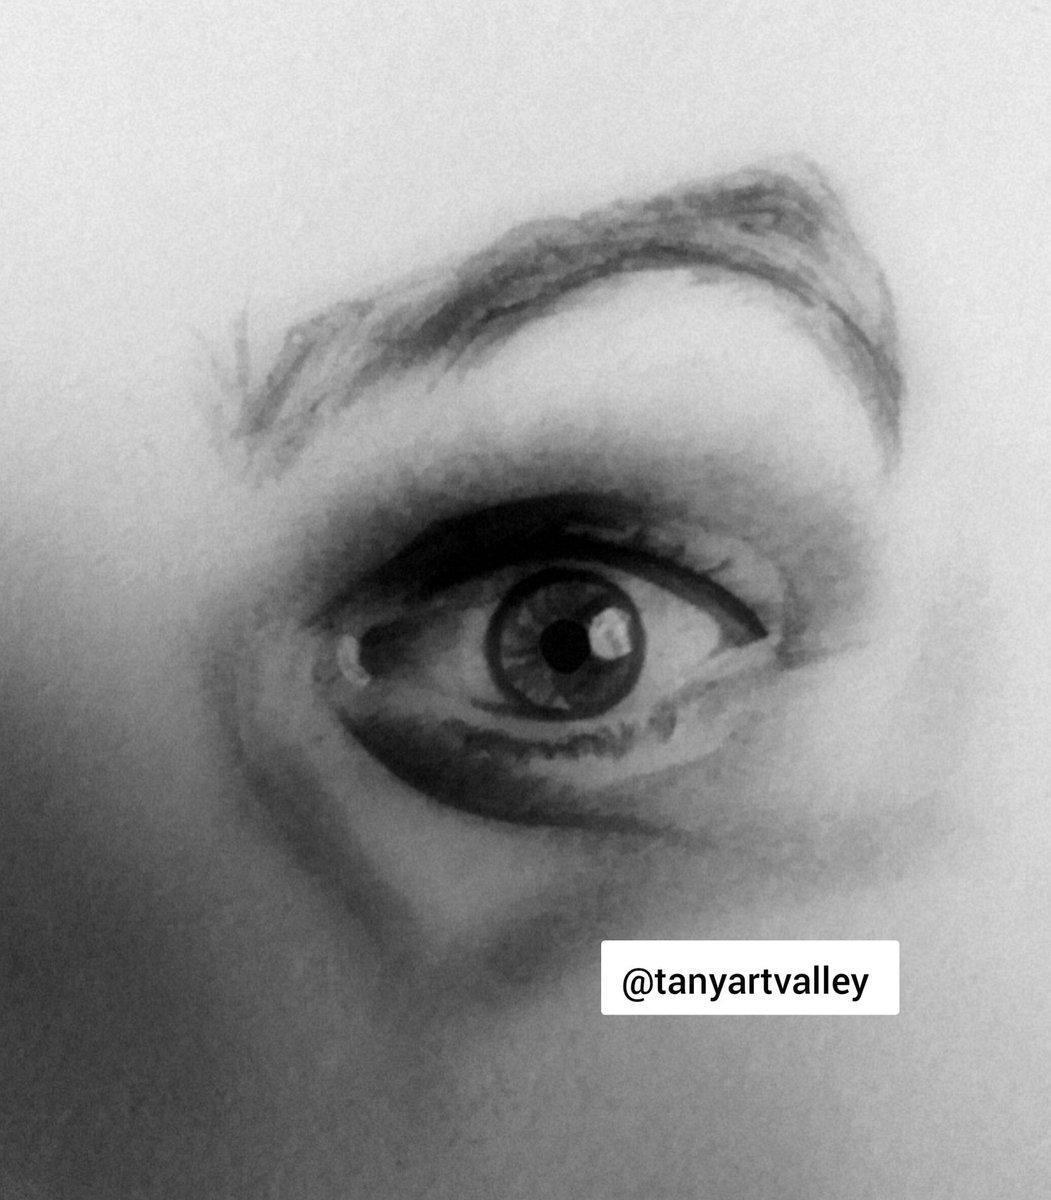 'Surprise'  Sixth eye in the series of six eyes depicting six different emotions.  #eyes #eyesart #ArtistOnTwitter #artwork #artists #art #shading #drawingoftheday #drawingart #drawing #Emotions